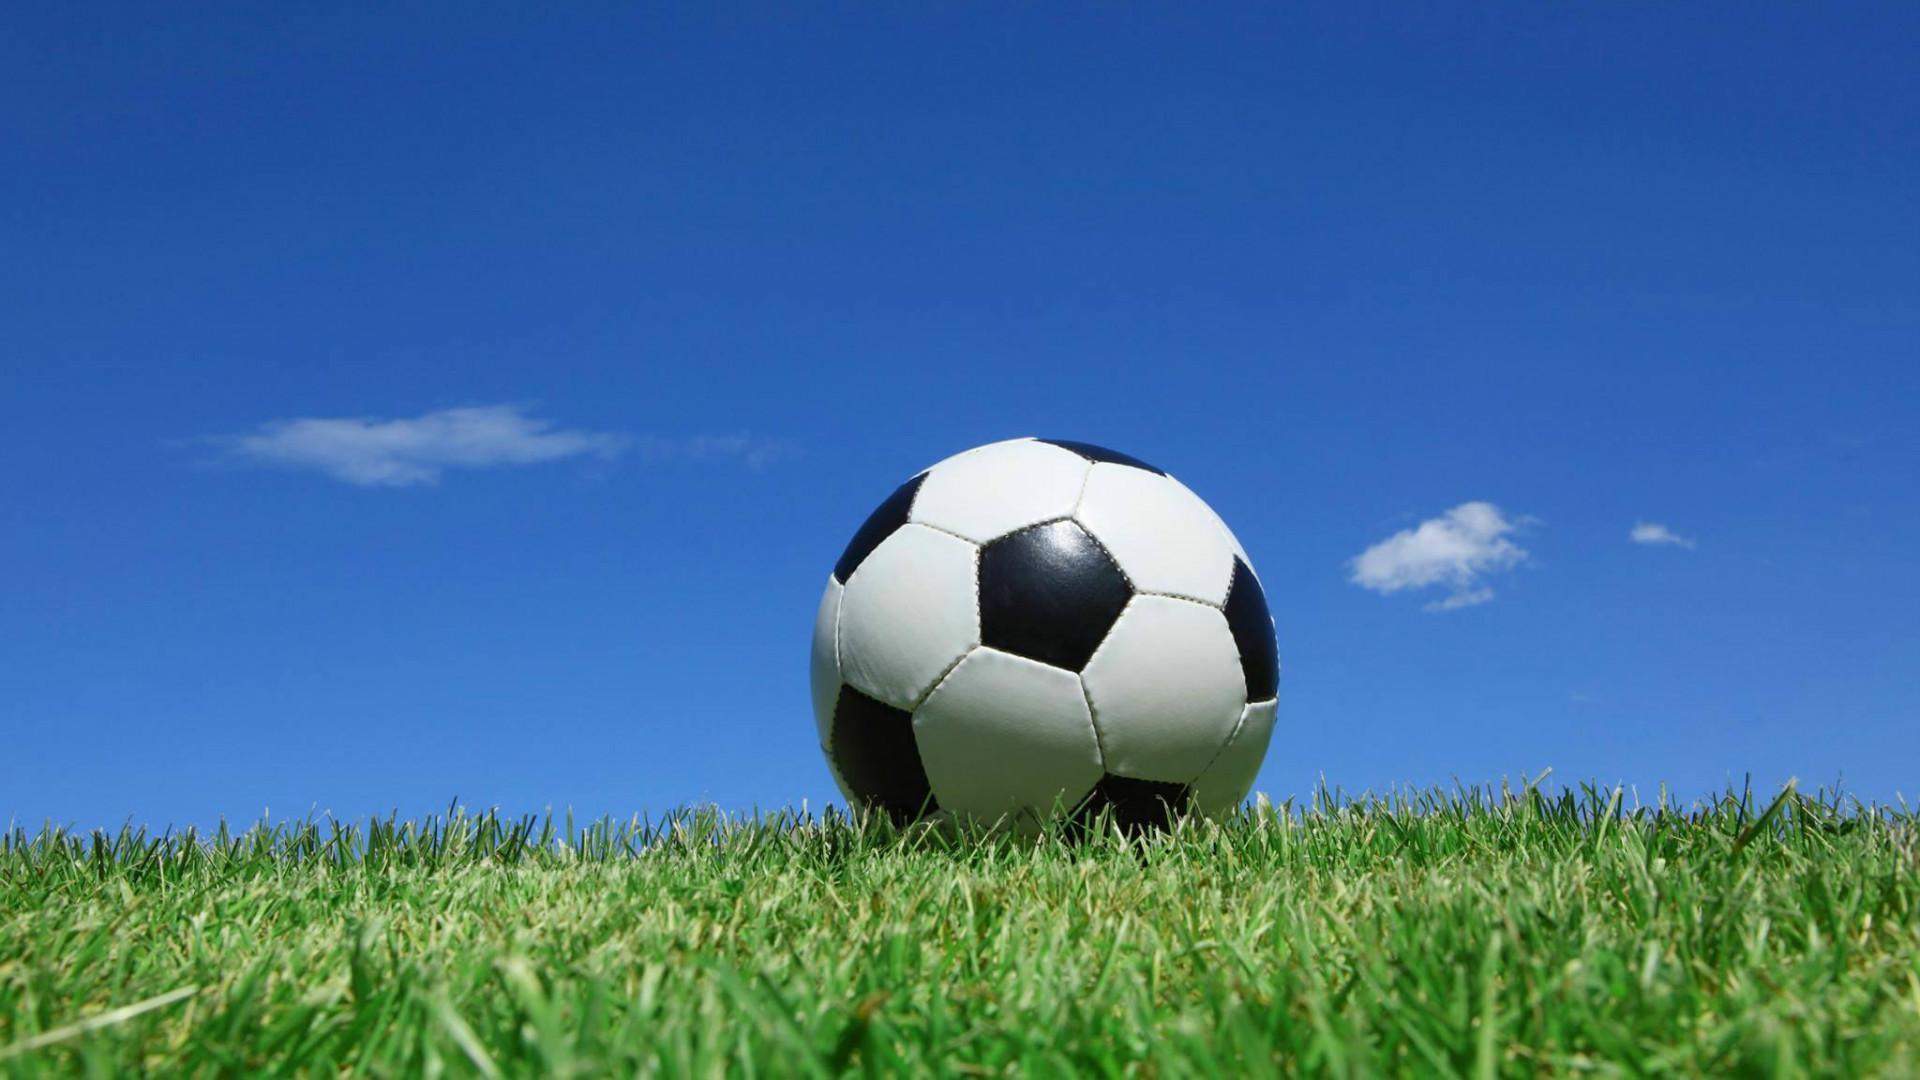 Gallery For gt Soccer Ball Wallpaper Desktop 1920x1080